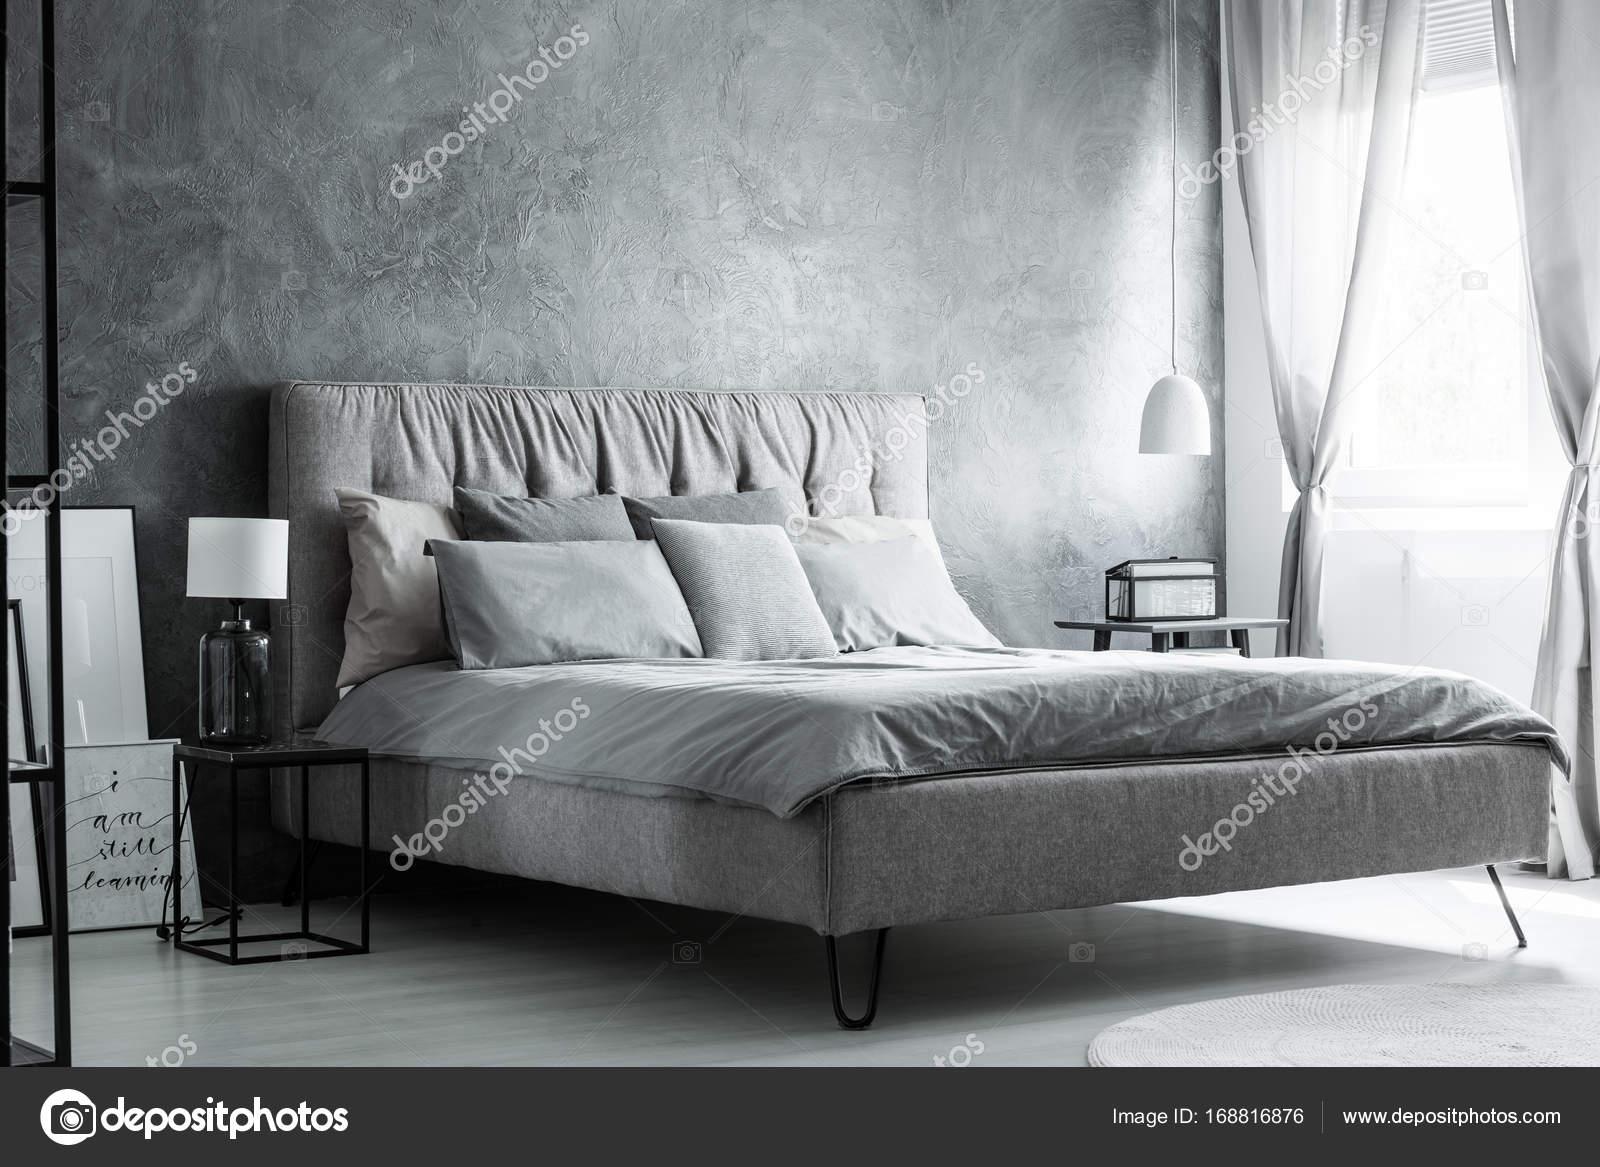 Graue Kissen auf Kingsize-Bett — Stockfoto © photographee.eu #168816876